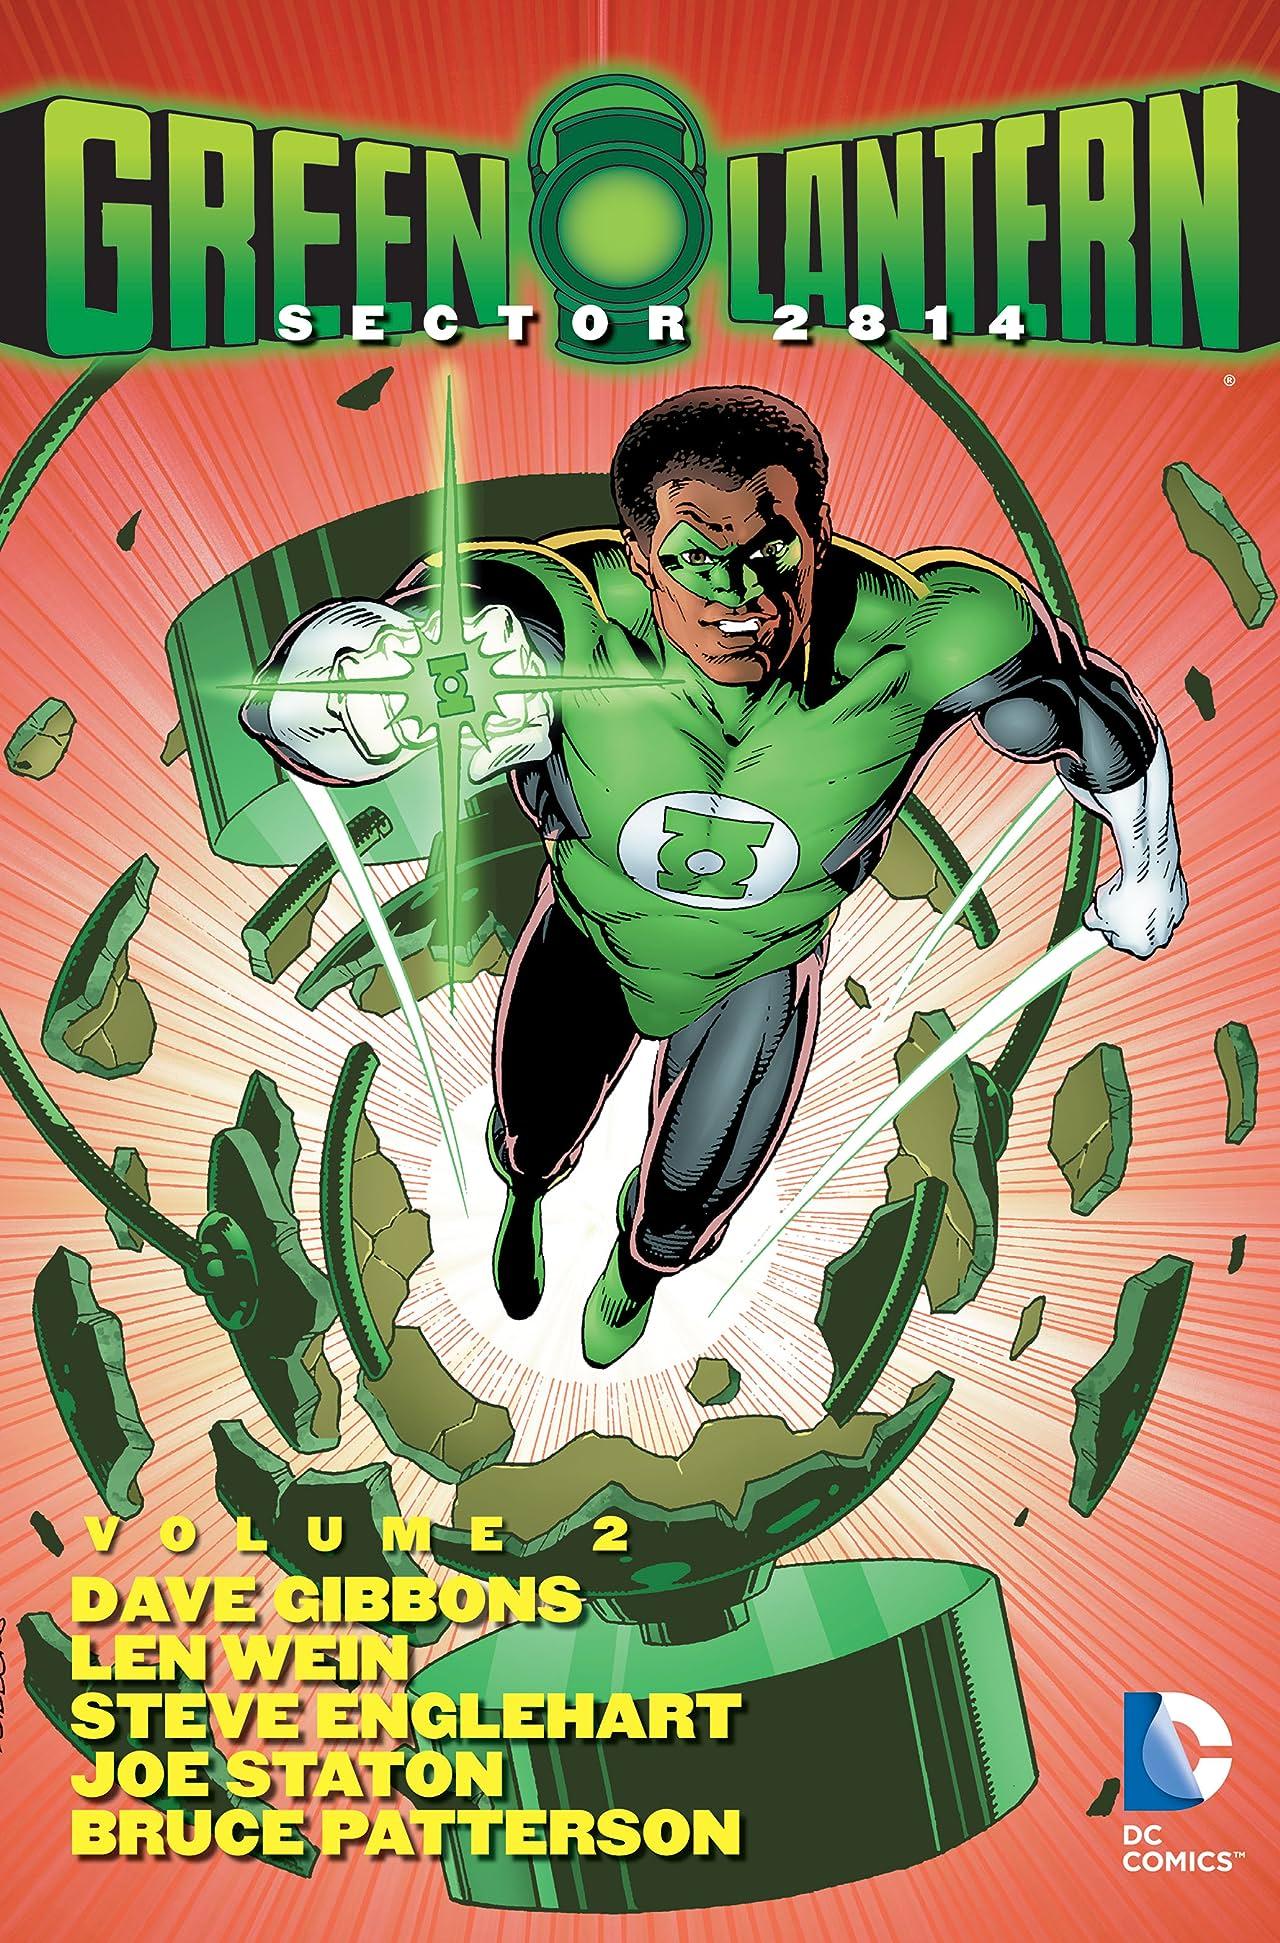 Green Lantern: Sector 2814 Vol. 2